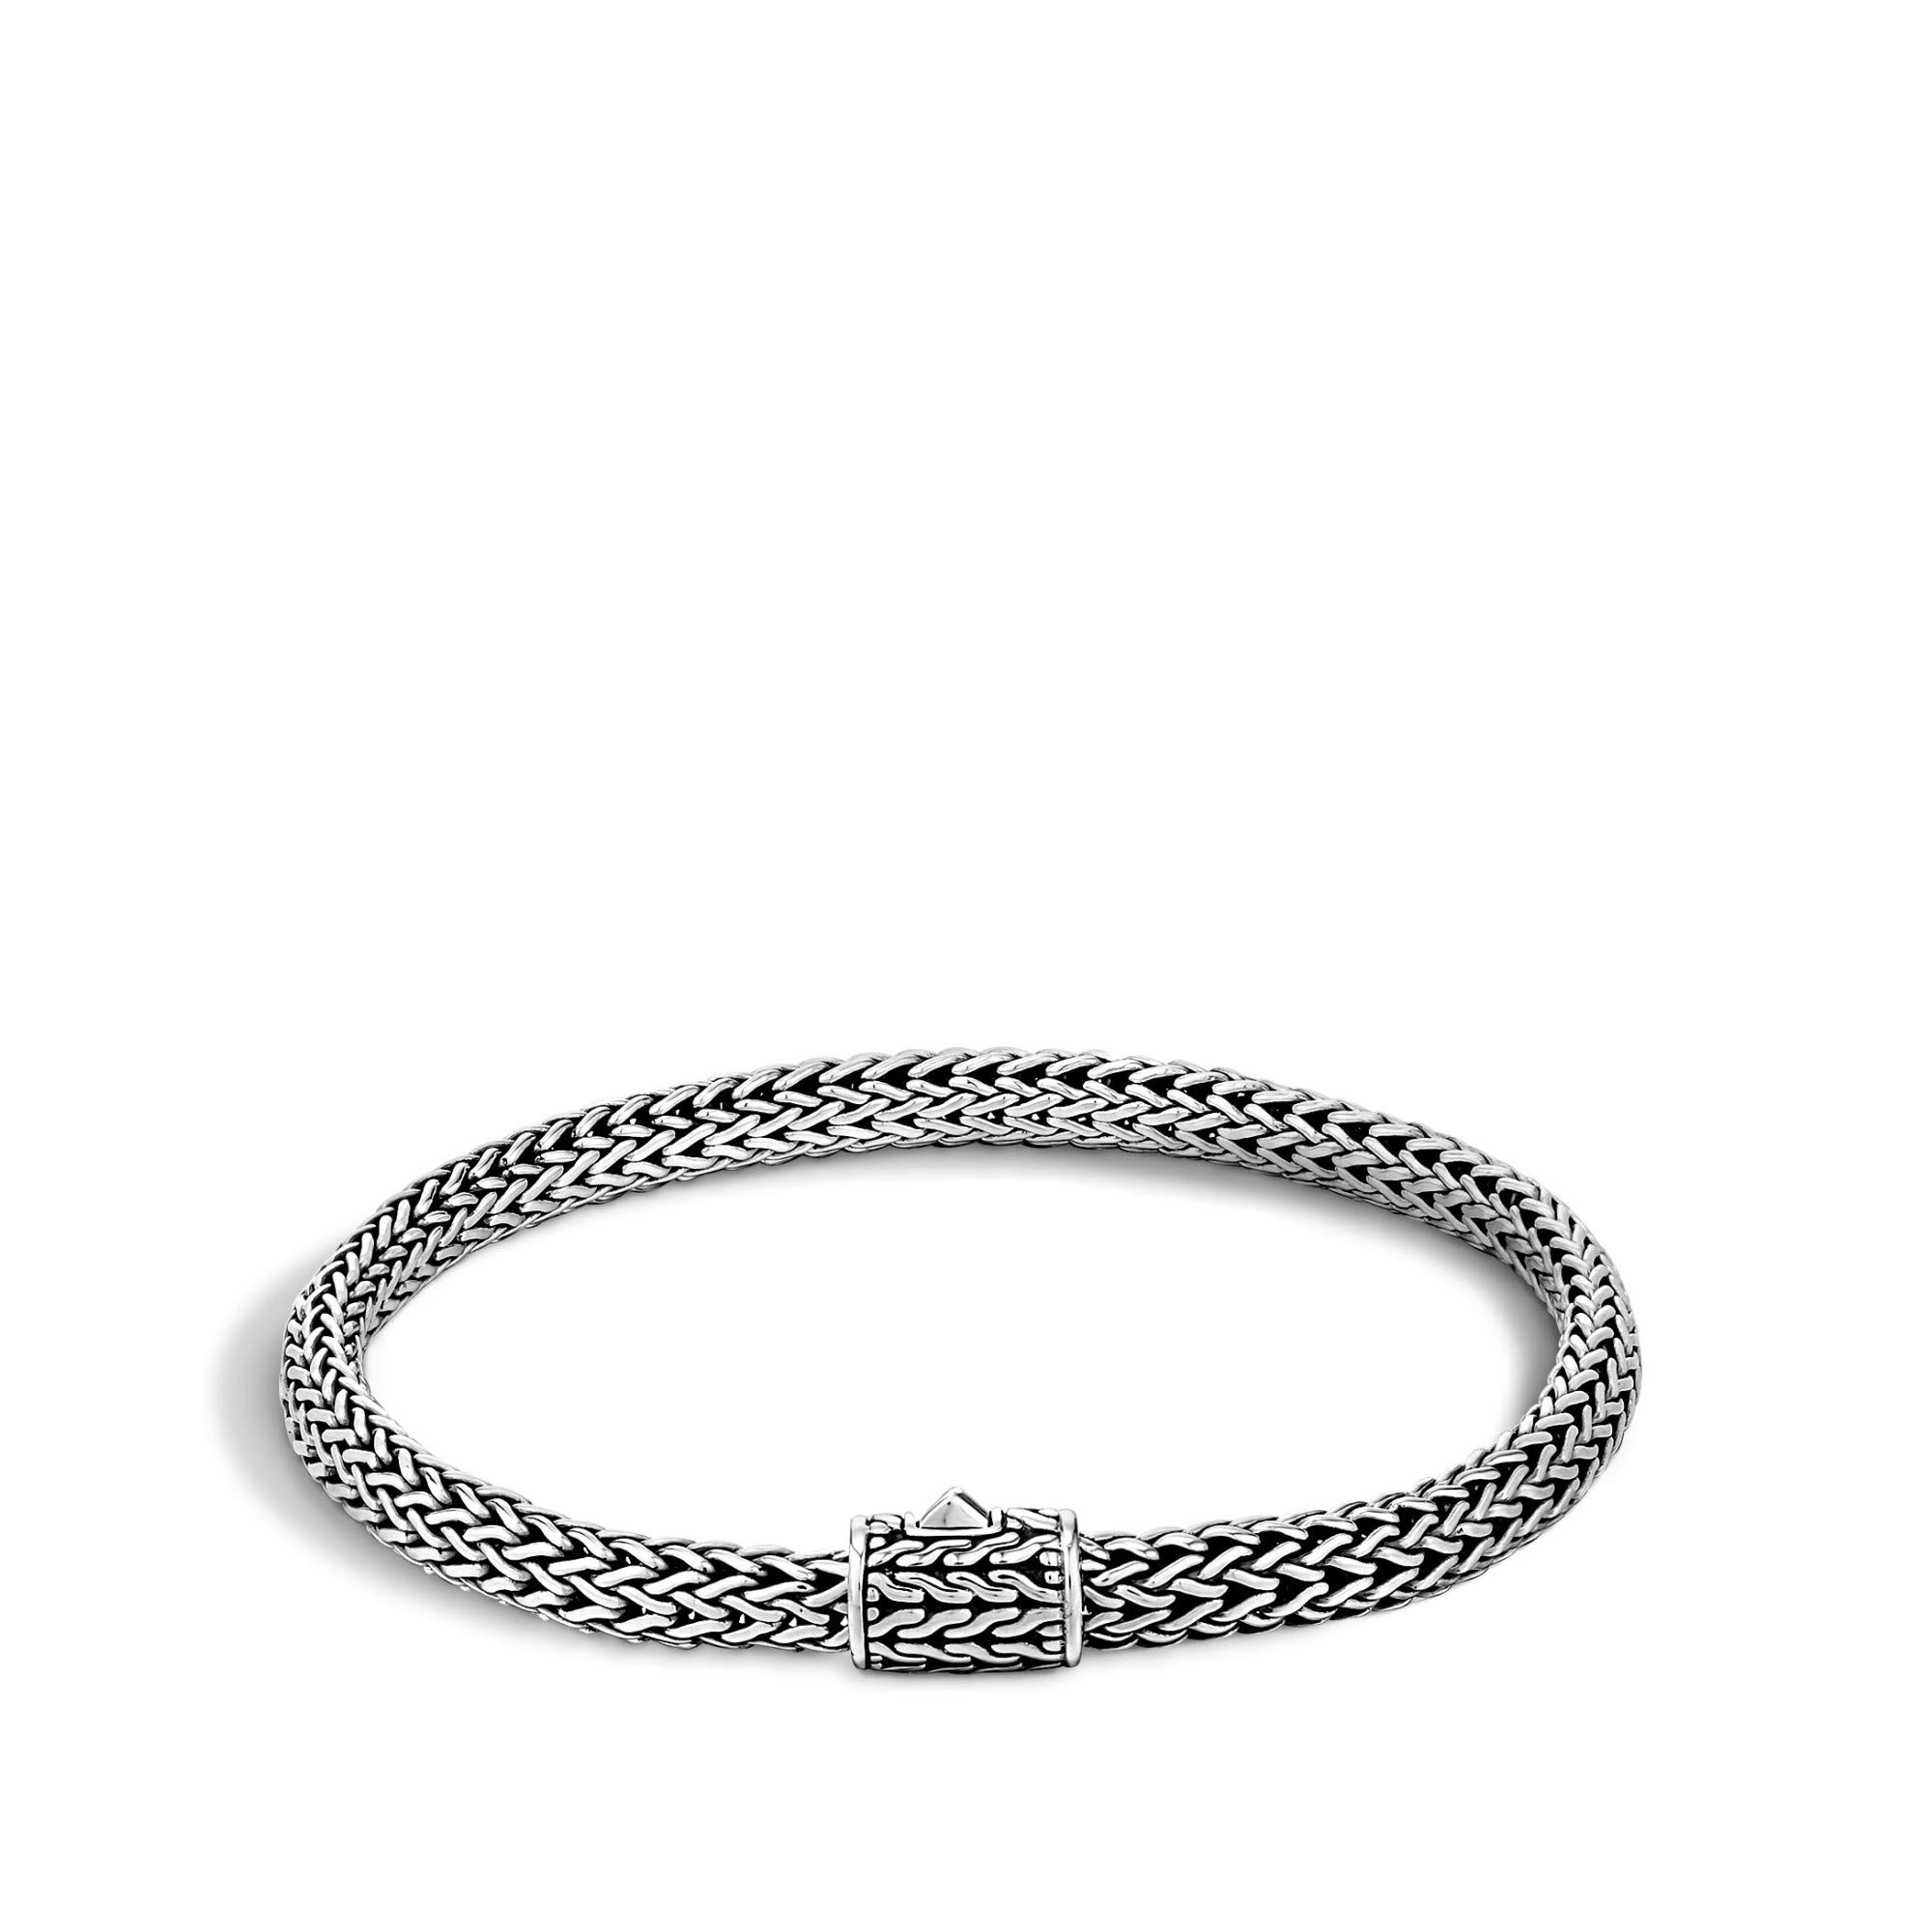 John Hardy Women's Classic Chain Silver Extra-Small Bracelet, Size S